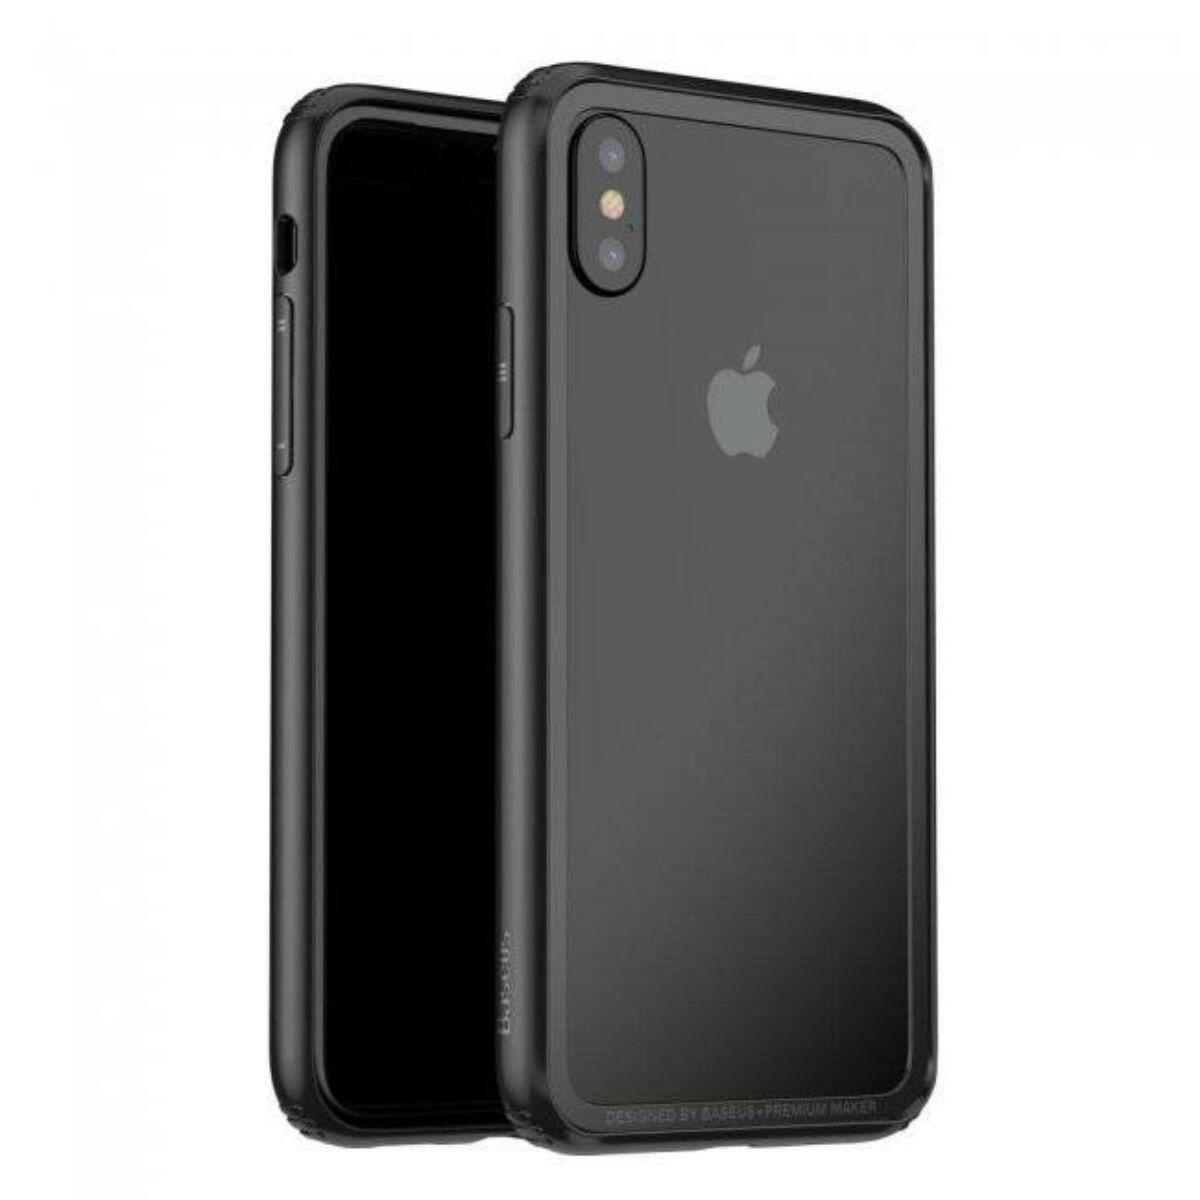 Baseus iPhone X/XS Hard and Soft telefonvédő gumikeret, fekete (FRAPIPHX-01)